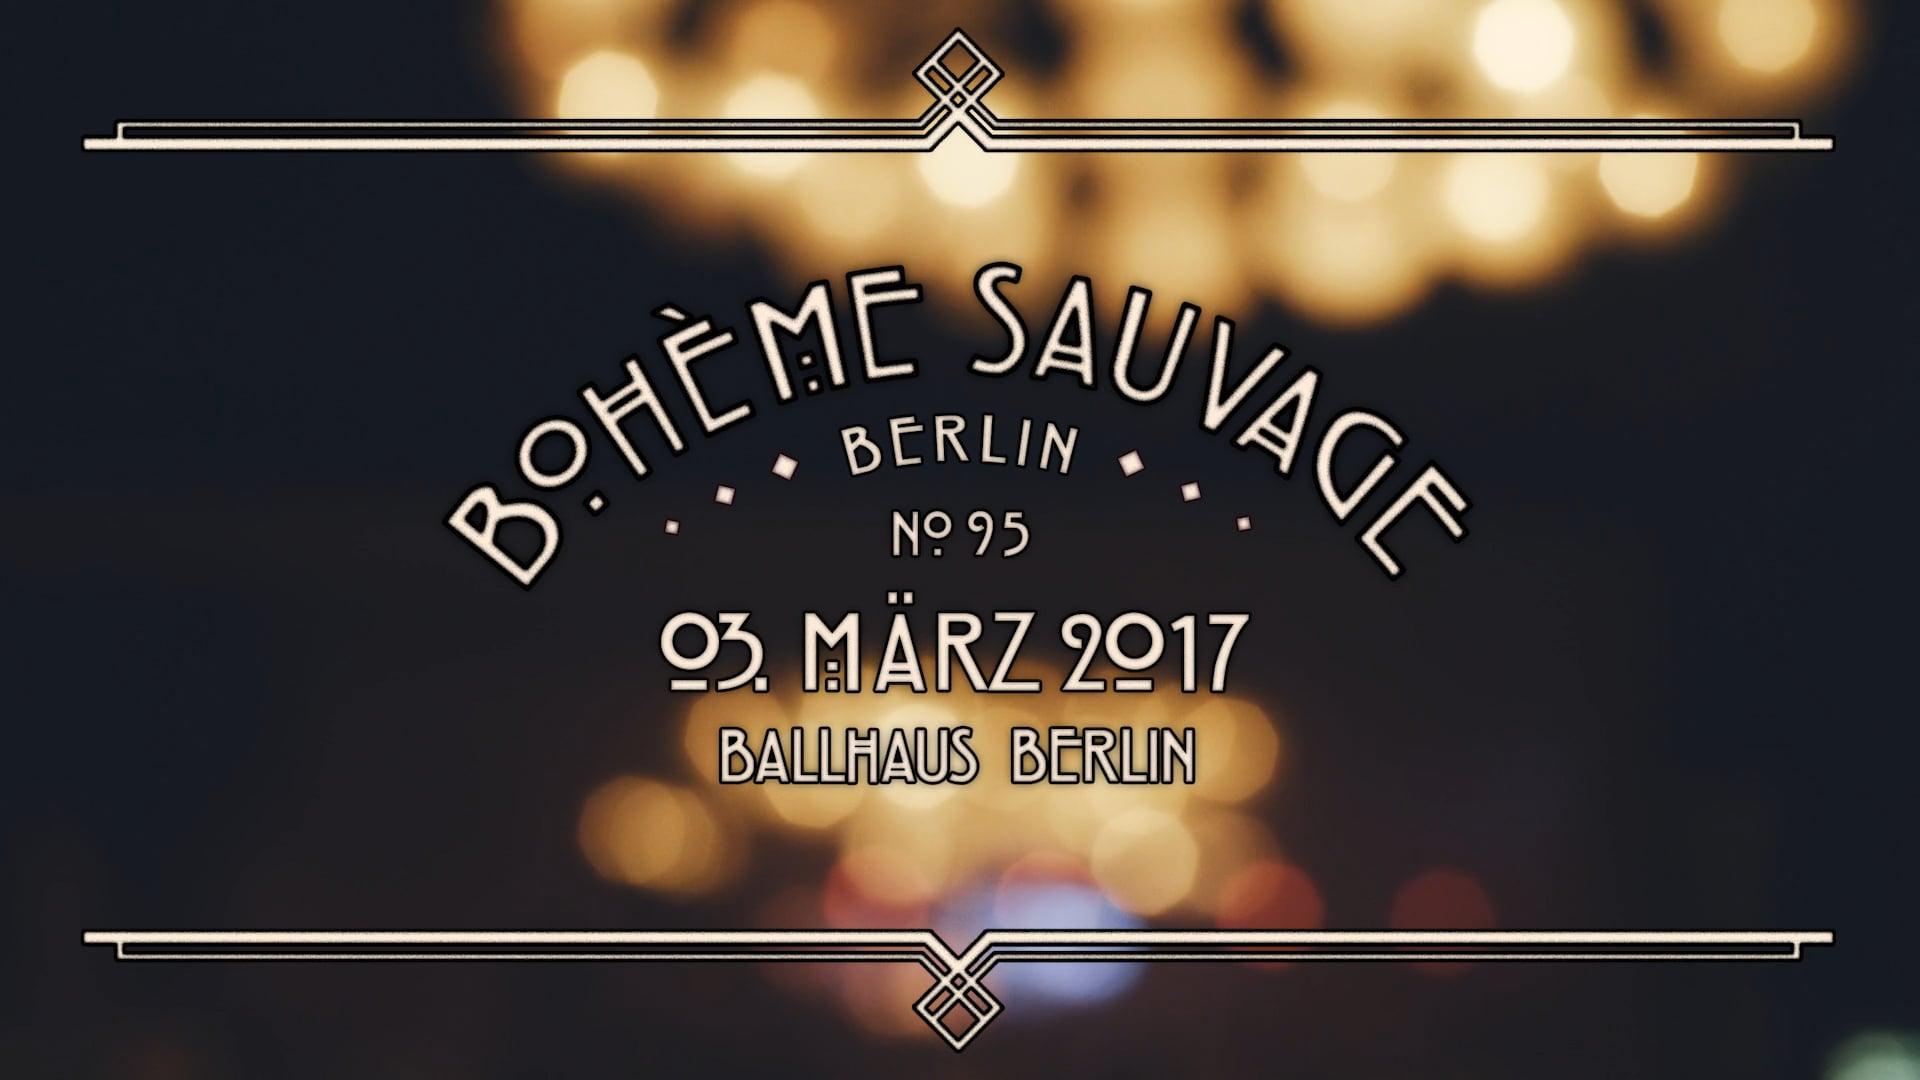 Bohème Sauvage Berlin Nº95 - 3. März 2018 - Ballhaus